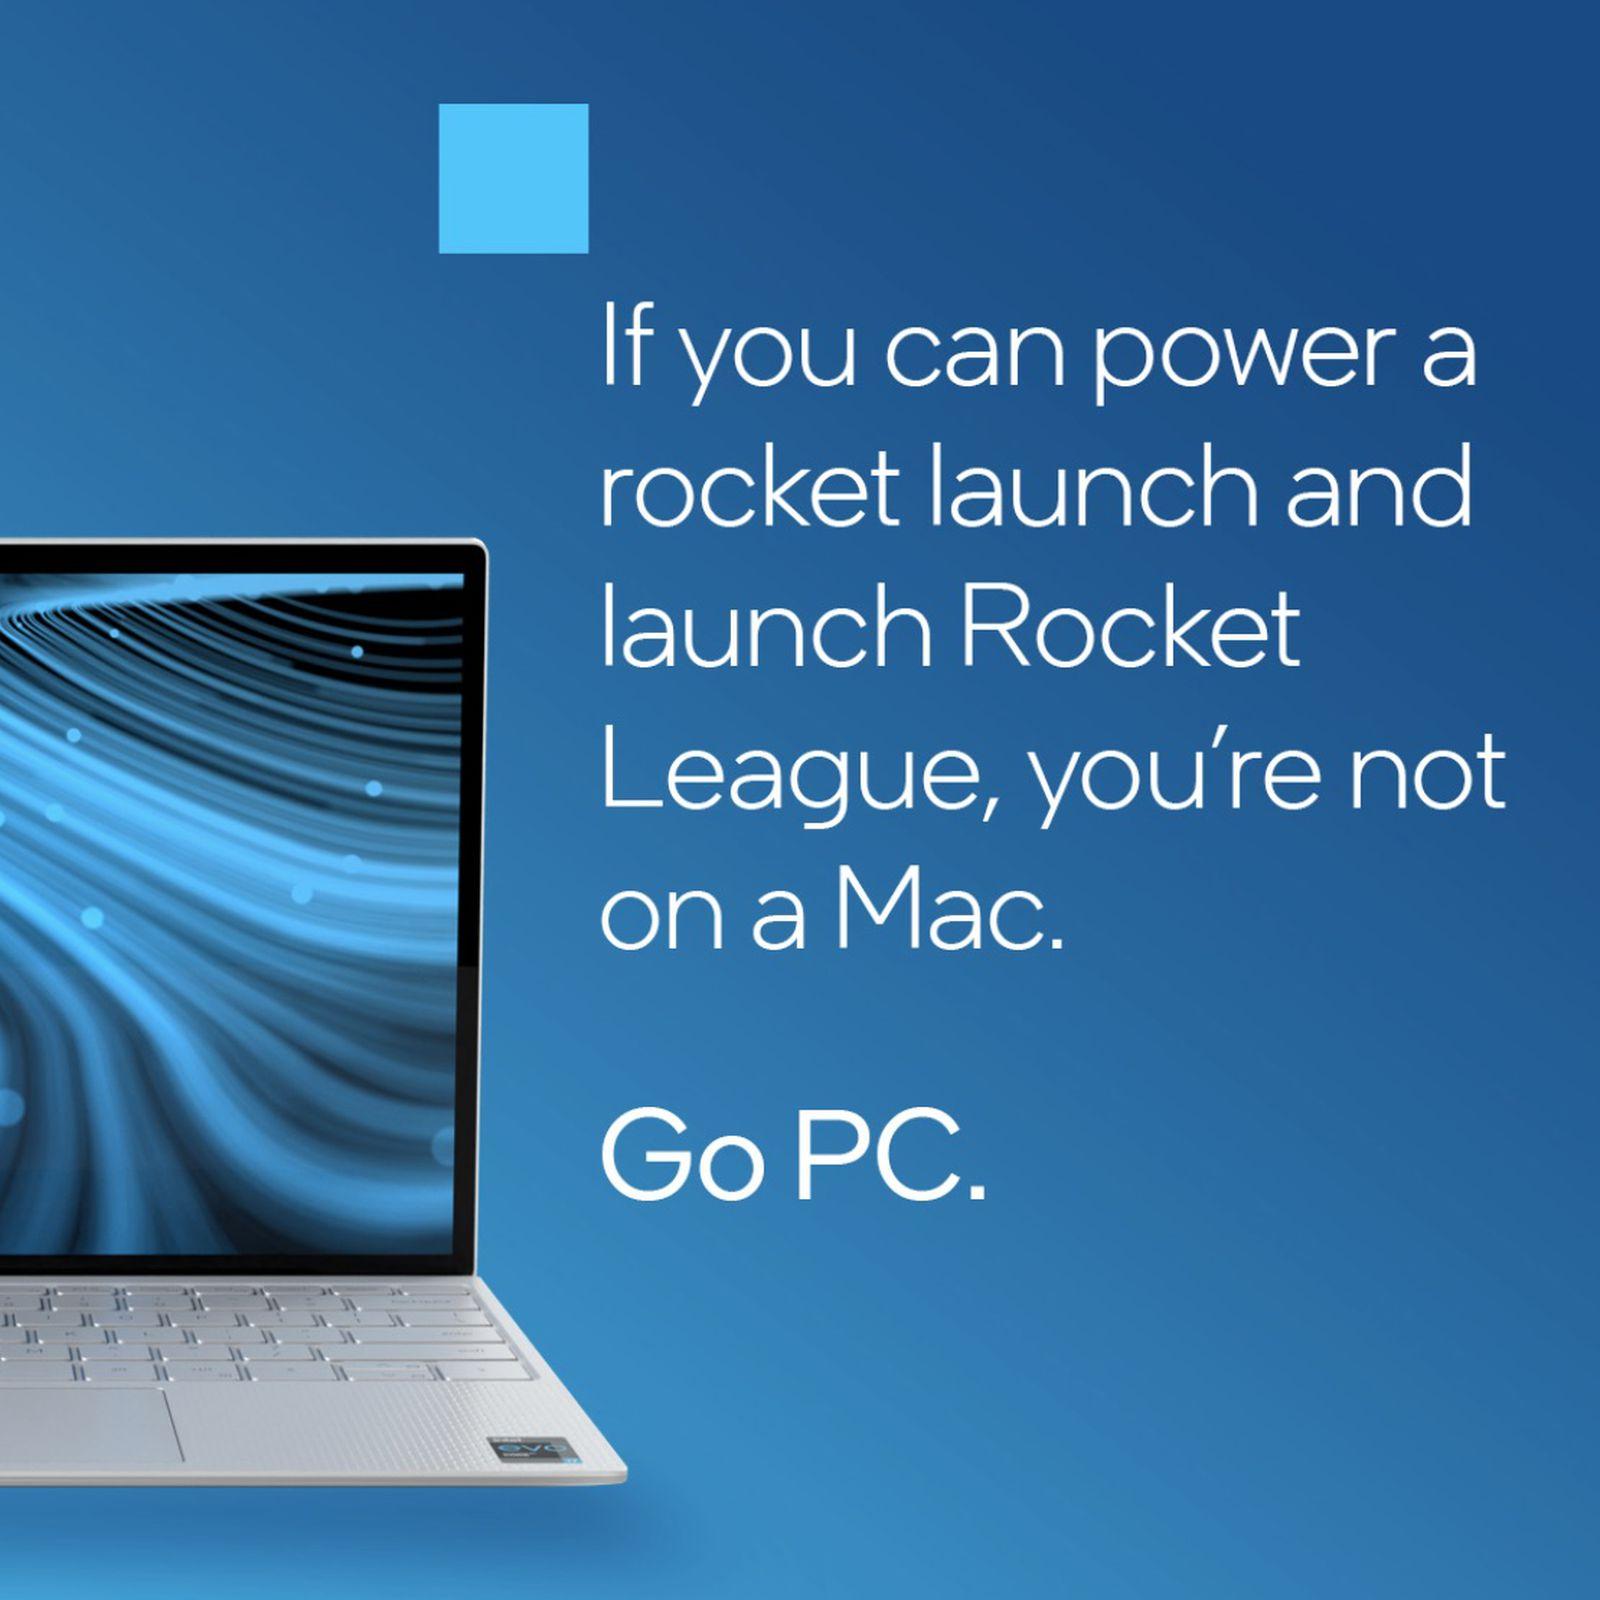 Intel's Anti-Mac Ad Campaign Highlights M1 Shortcomings - MacRumors